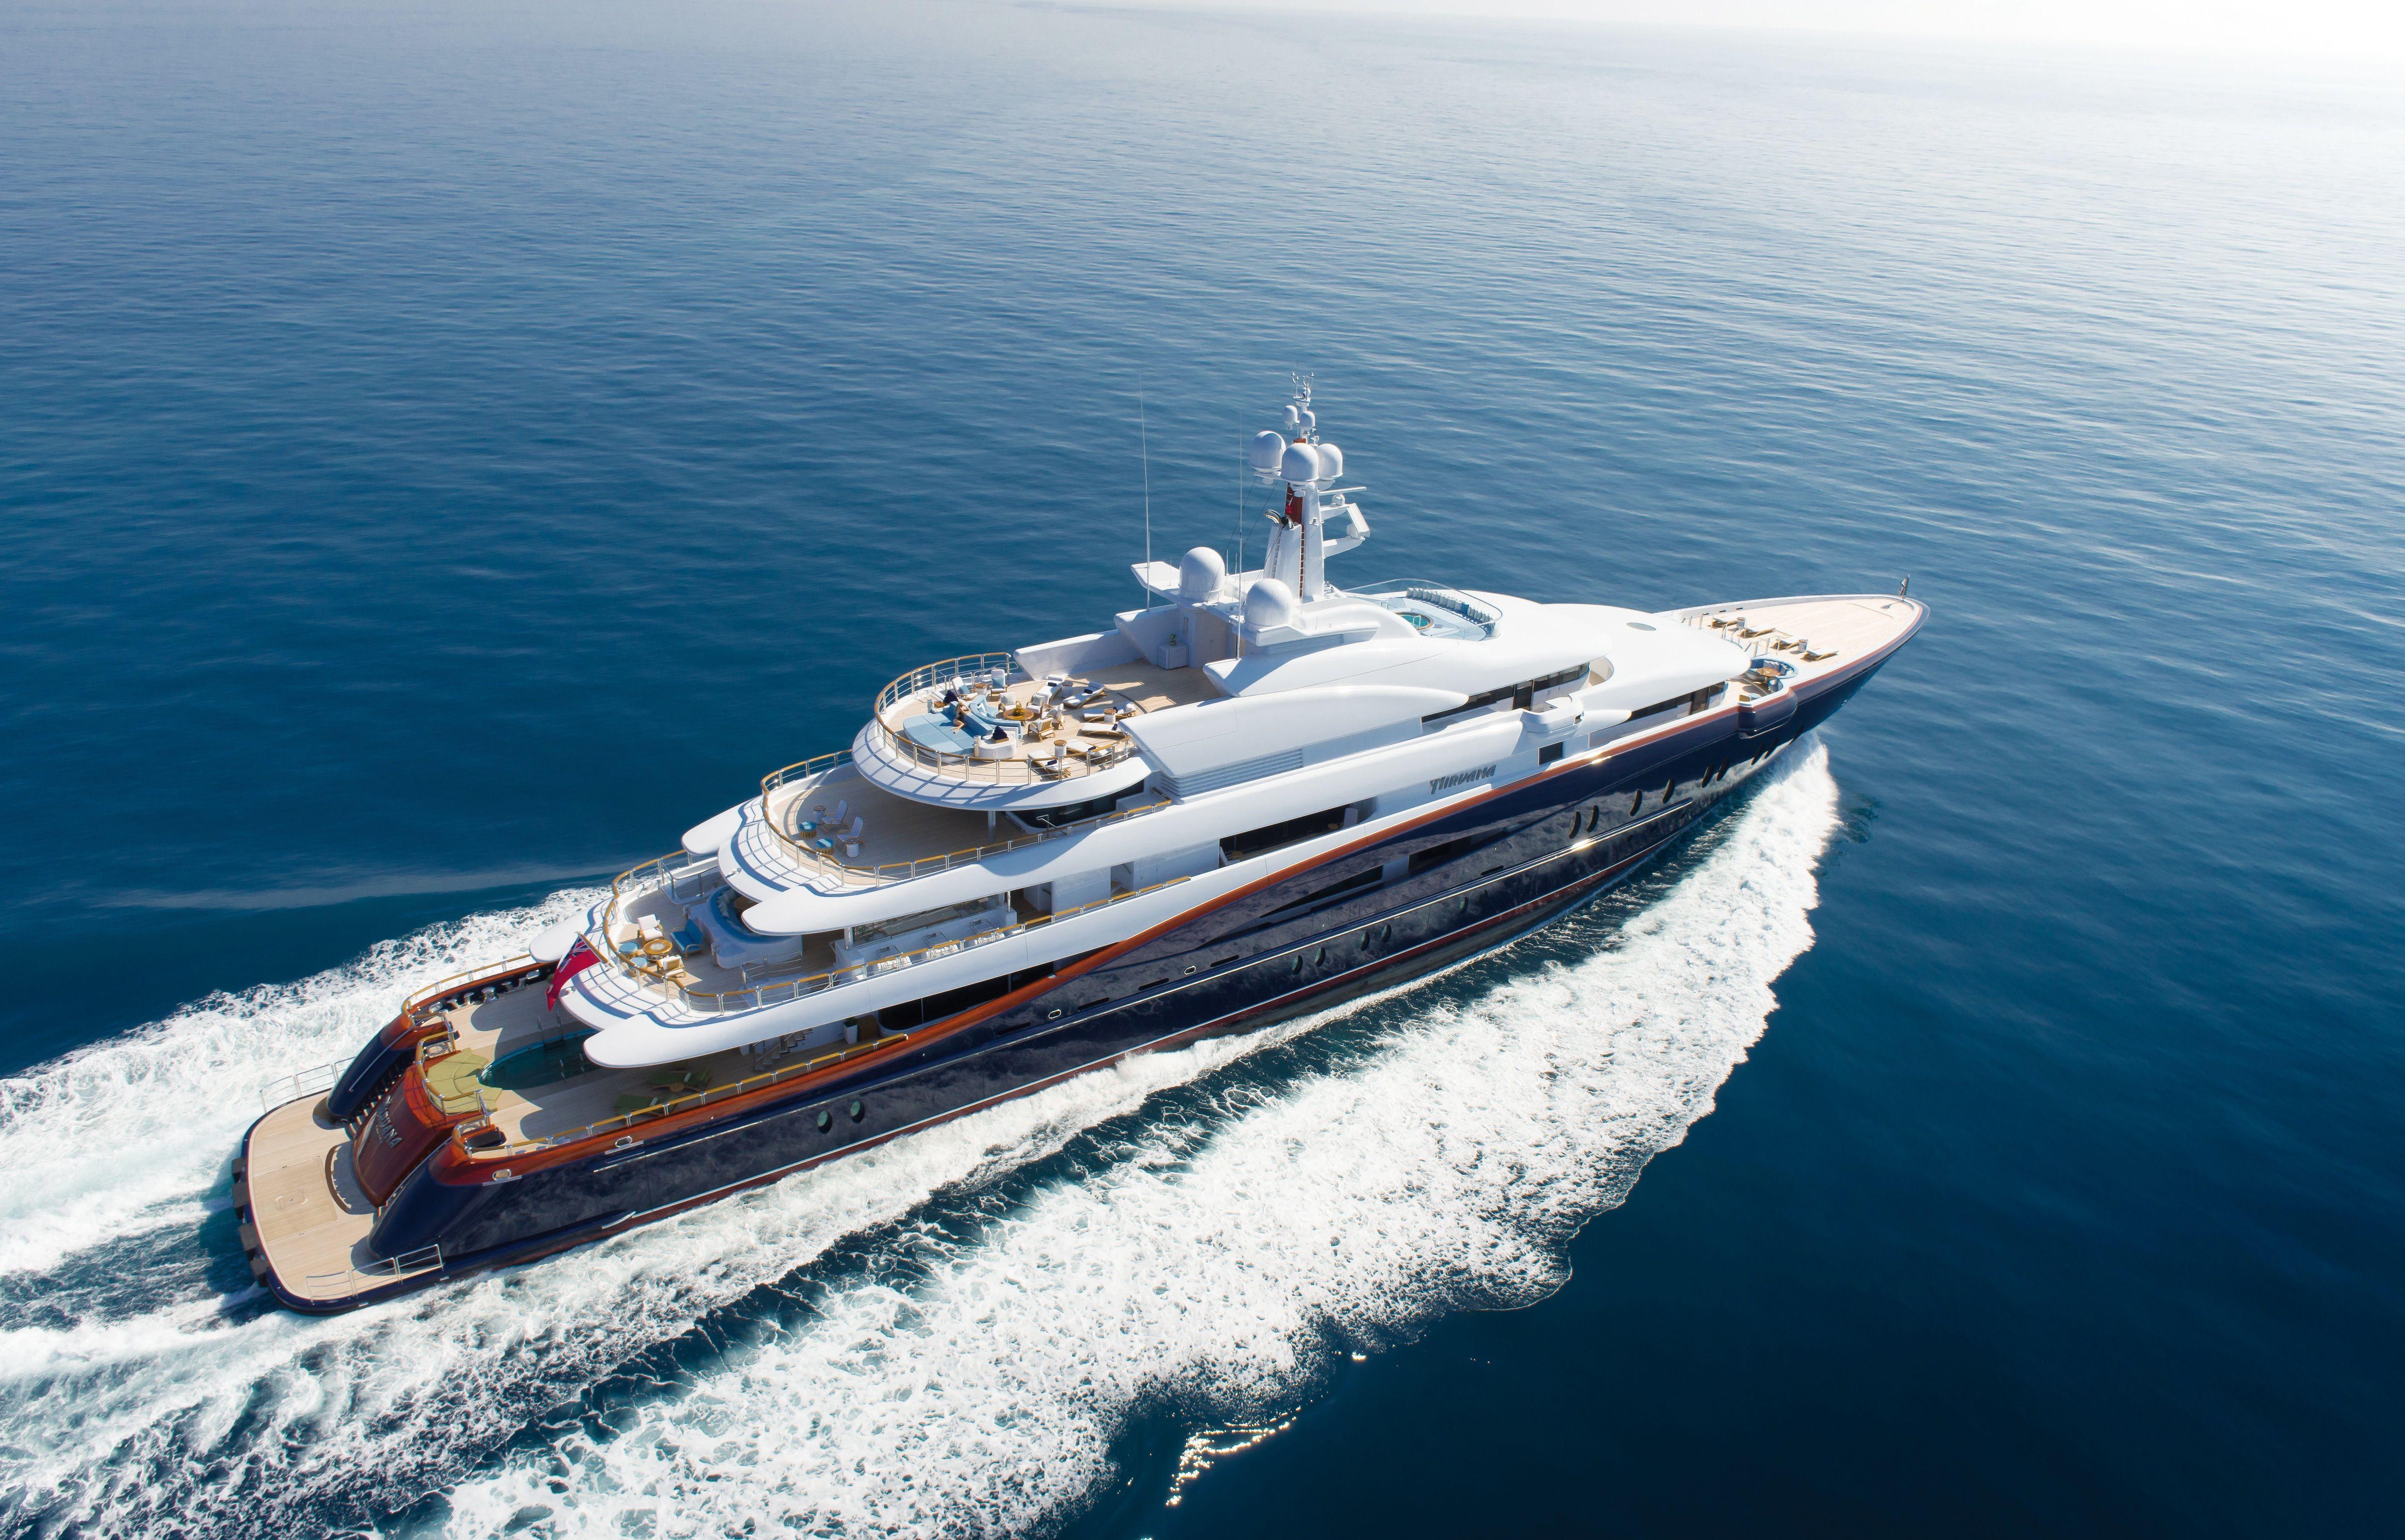 Nirvana yacht charter price oceanco luxury yacht charter - Explore Nirvana Yachts And More